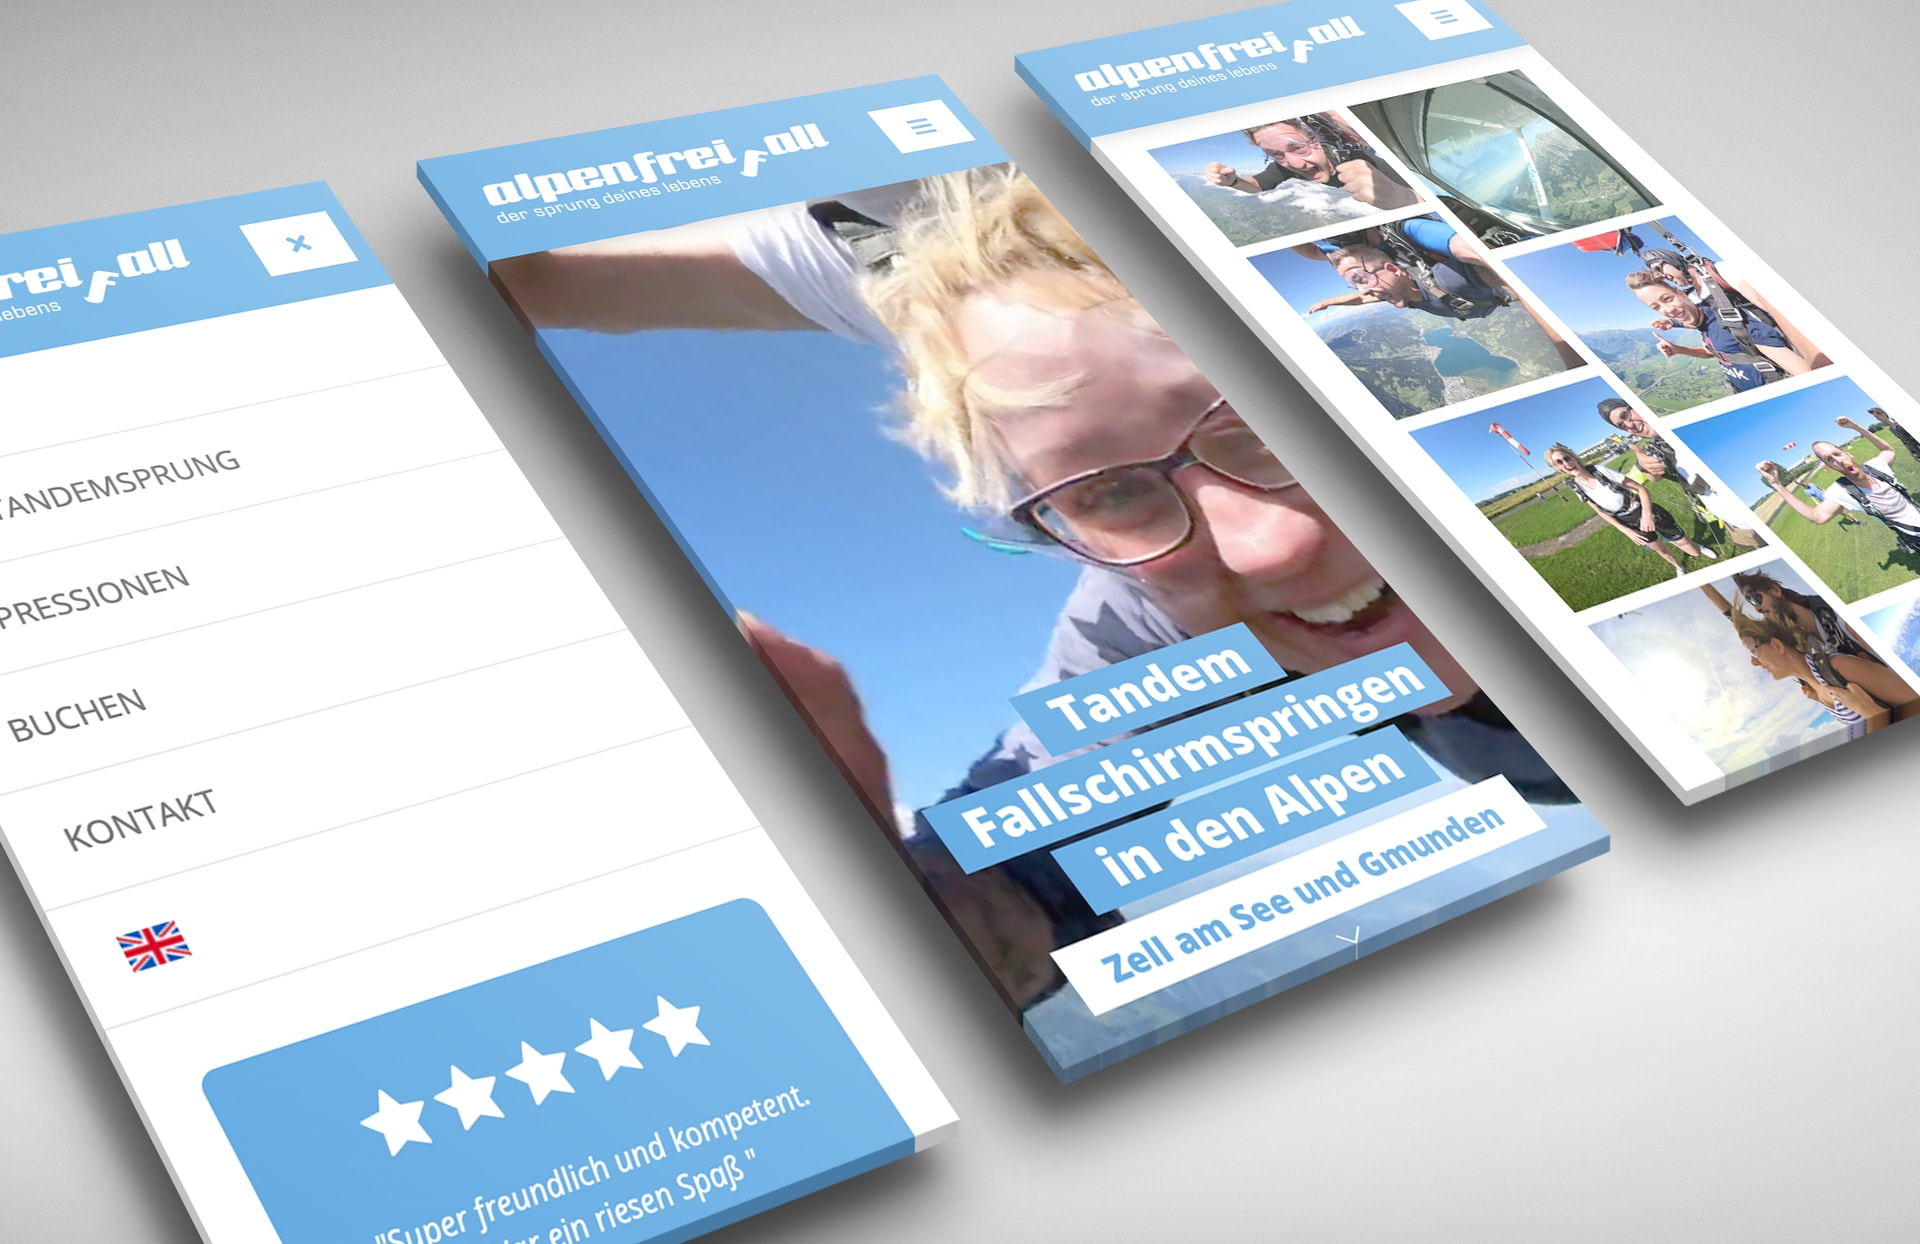 'referenz-alpenfreifall-gmbh-responsive-webdesign-phone